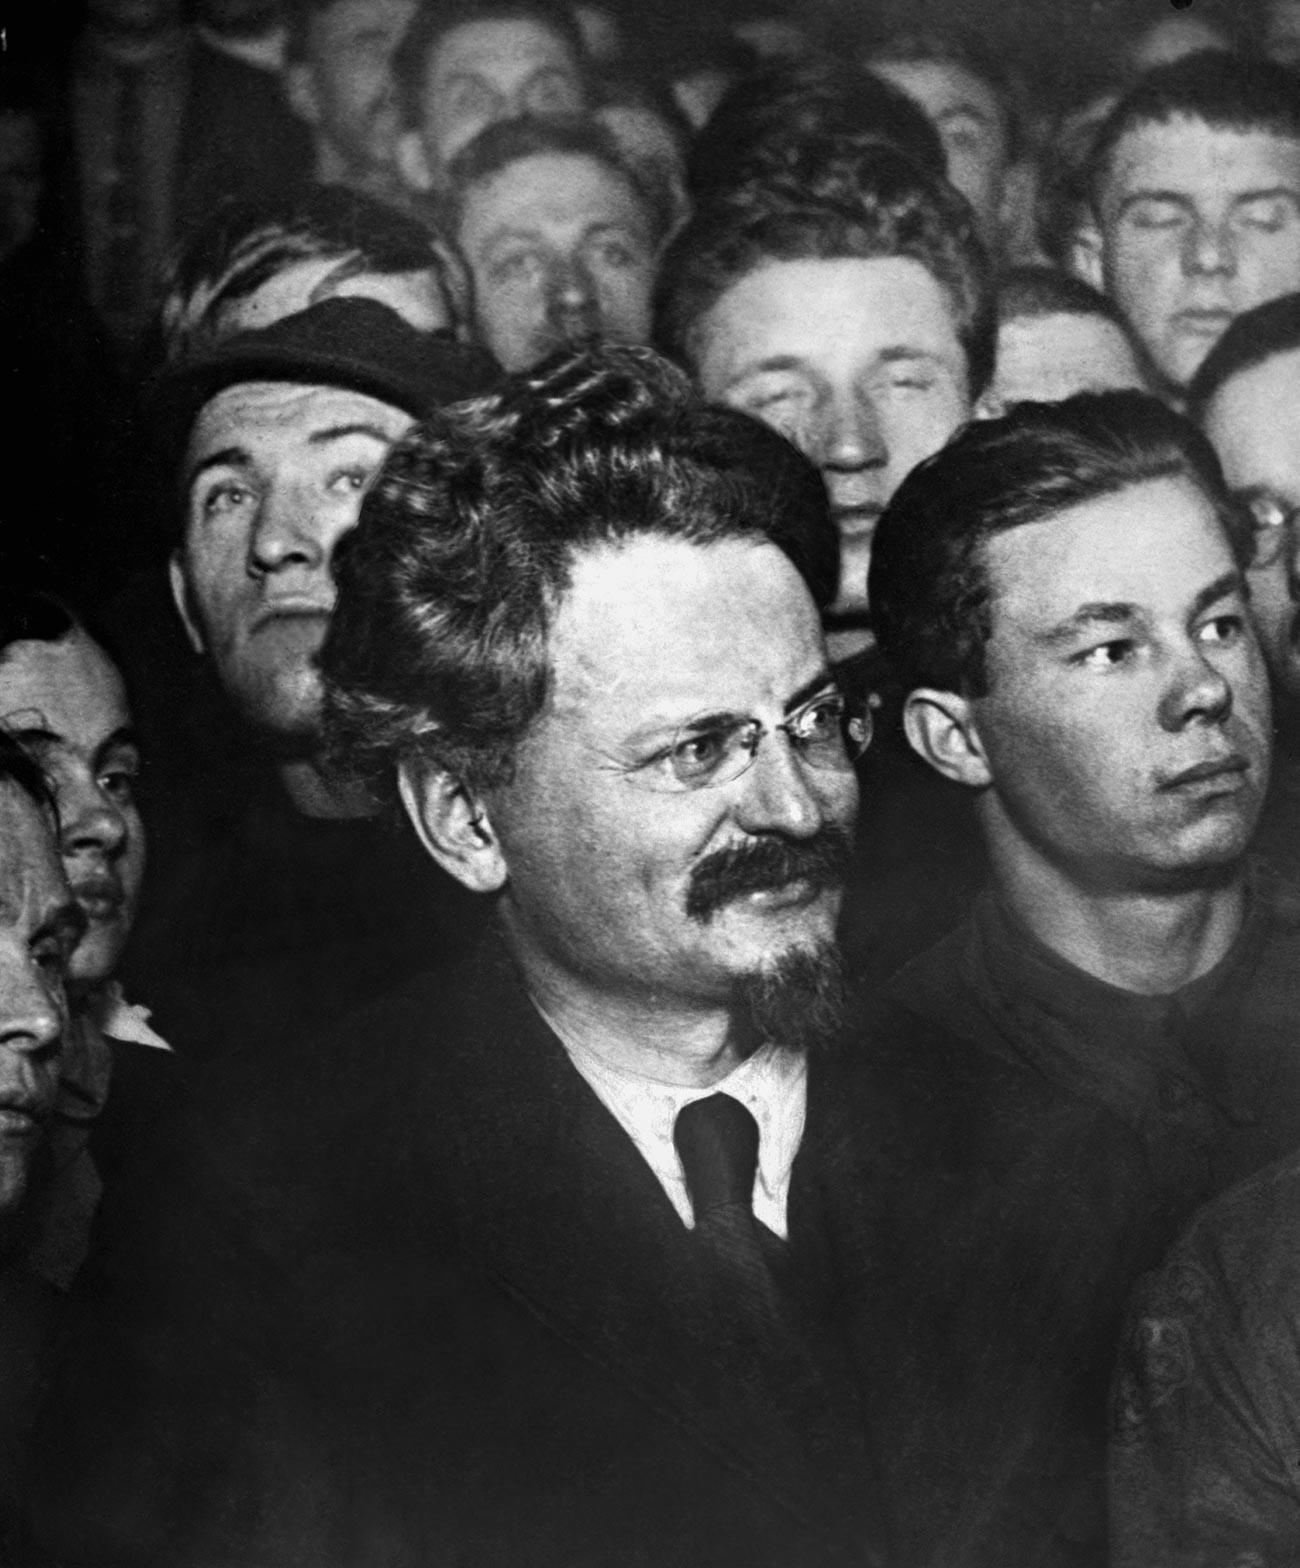 Лев Давидович Троцки (1879-1940, истинско име – Лев Бронщайн), руски революционер